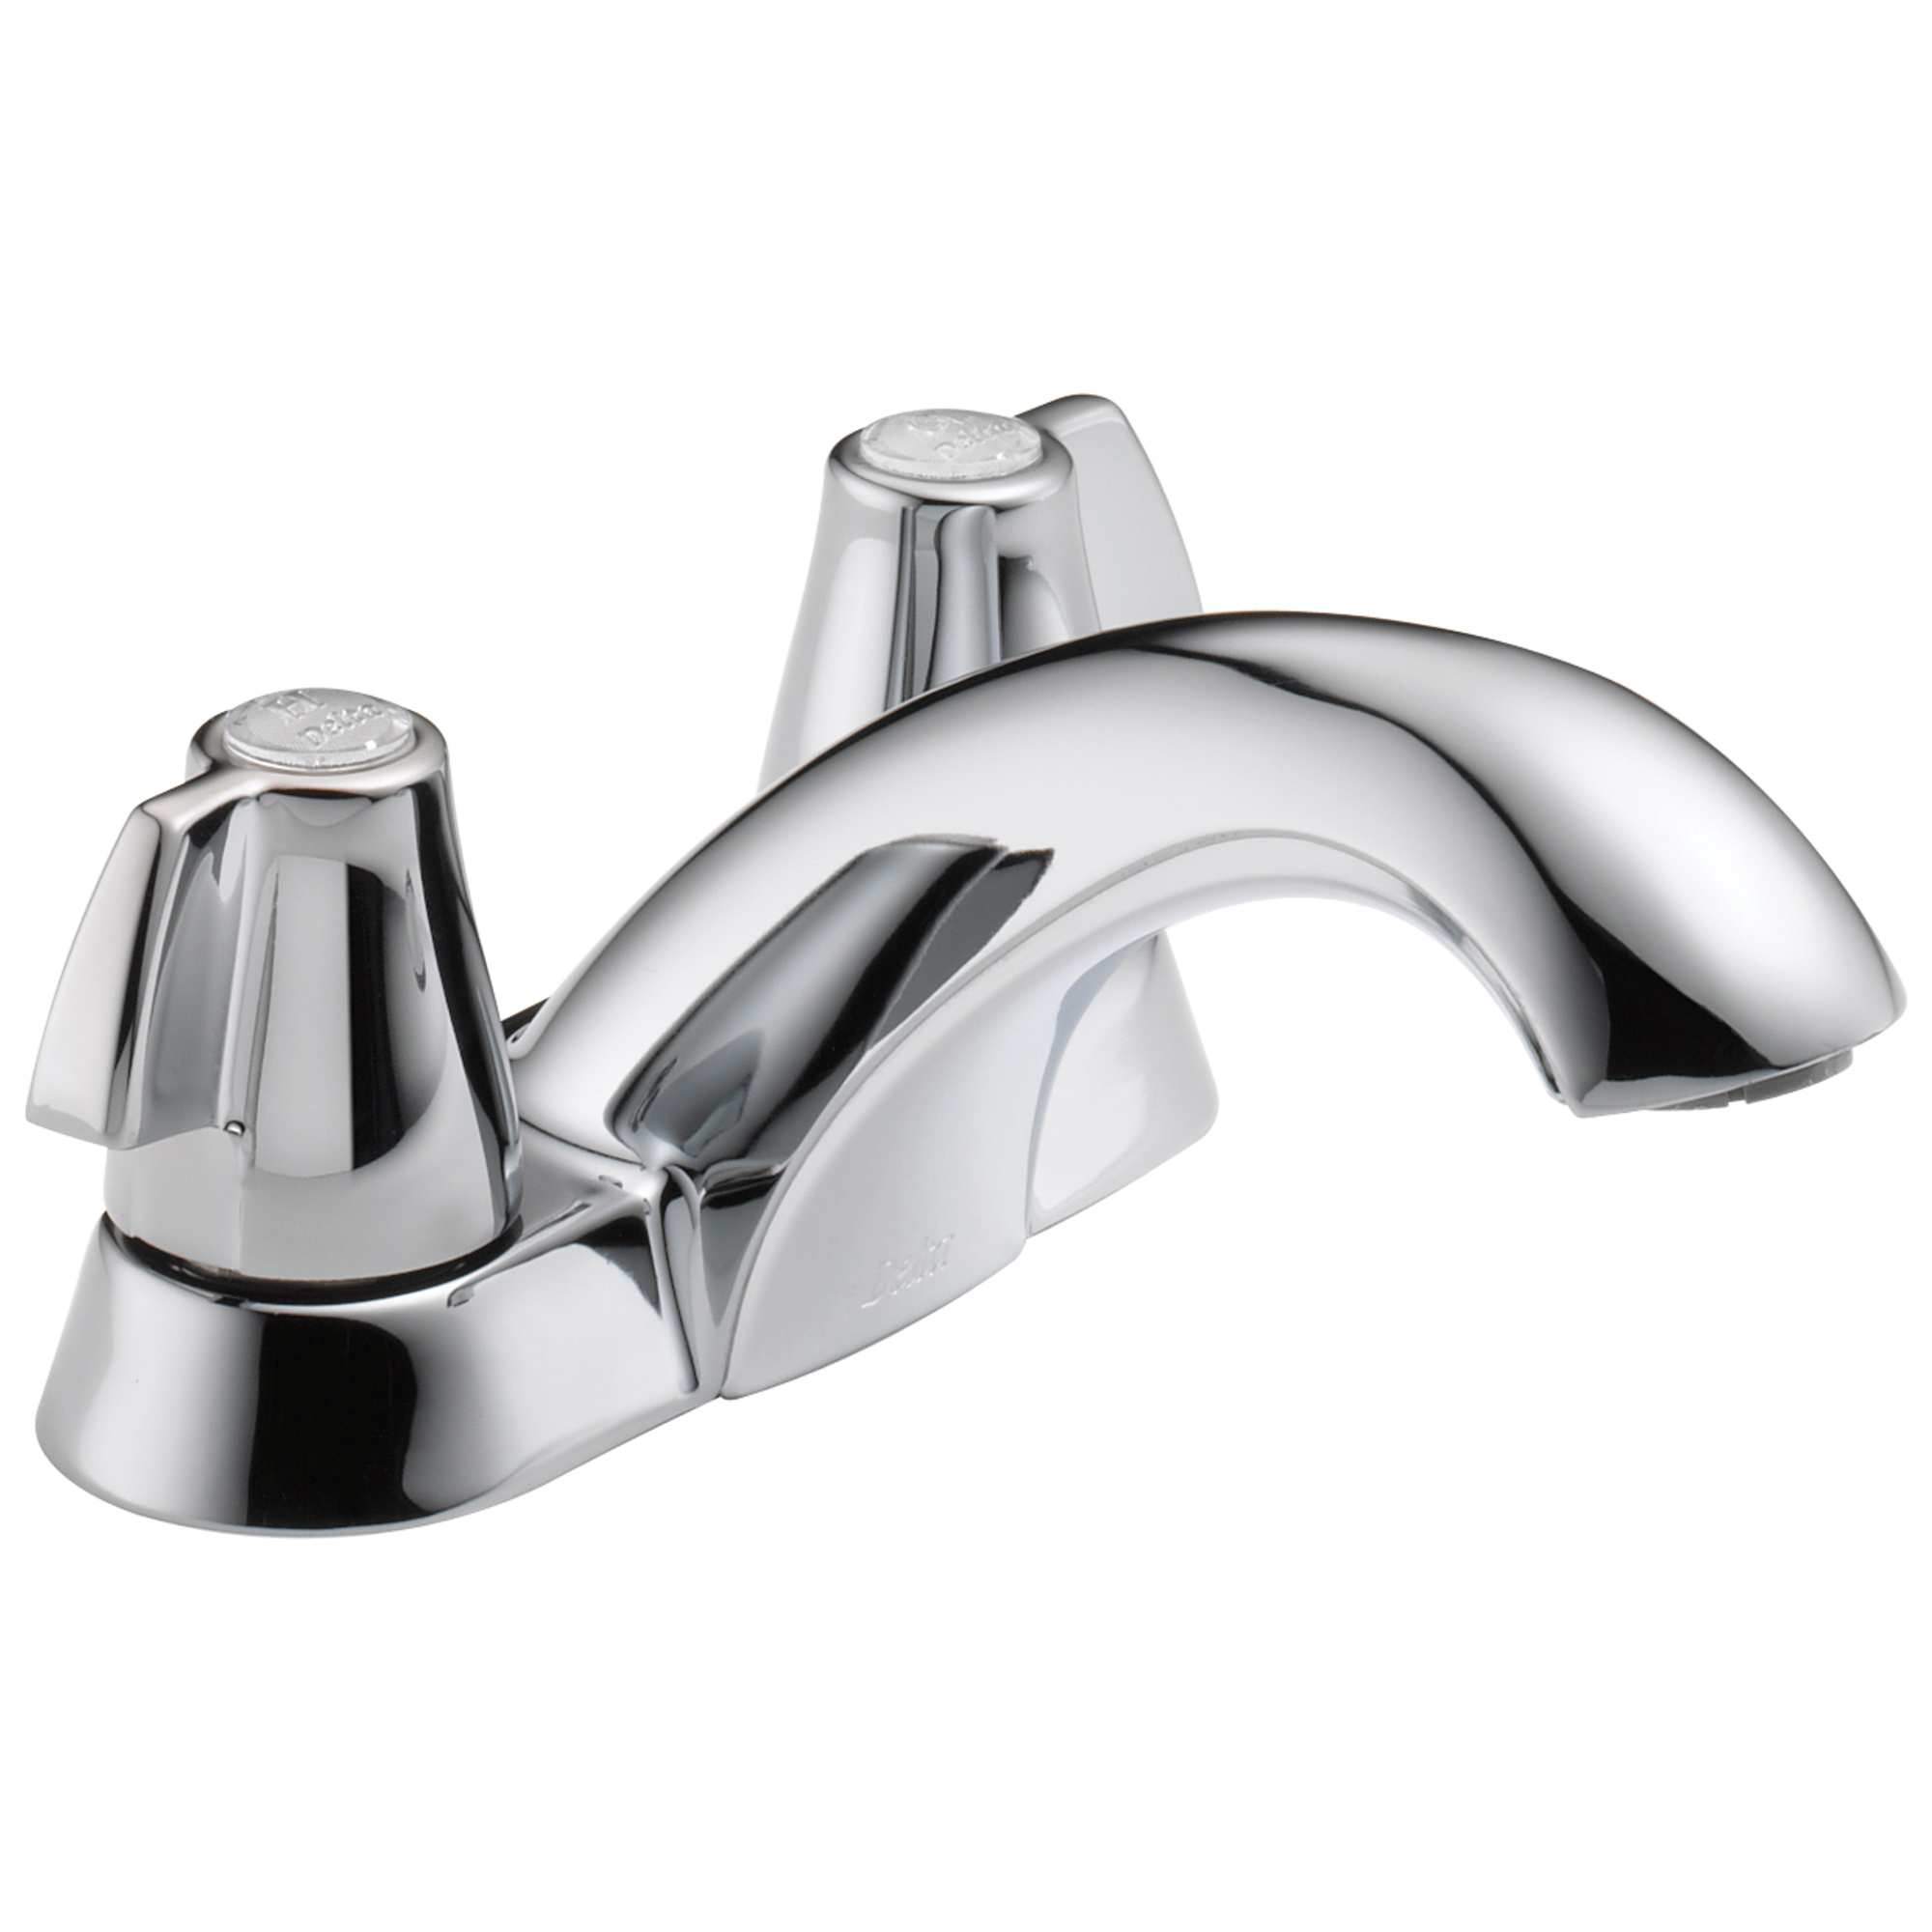 DELTA® 2500LF Classic Centerset Lavatory Faucet, Polished Chrome, 2 Handles, 1.2 gpm Flow Rate